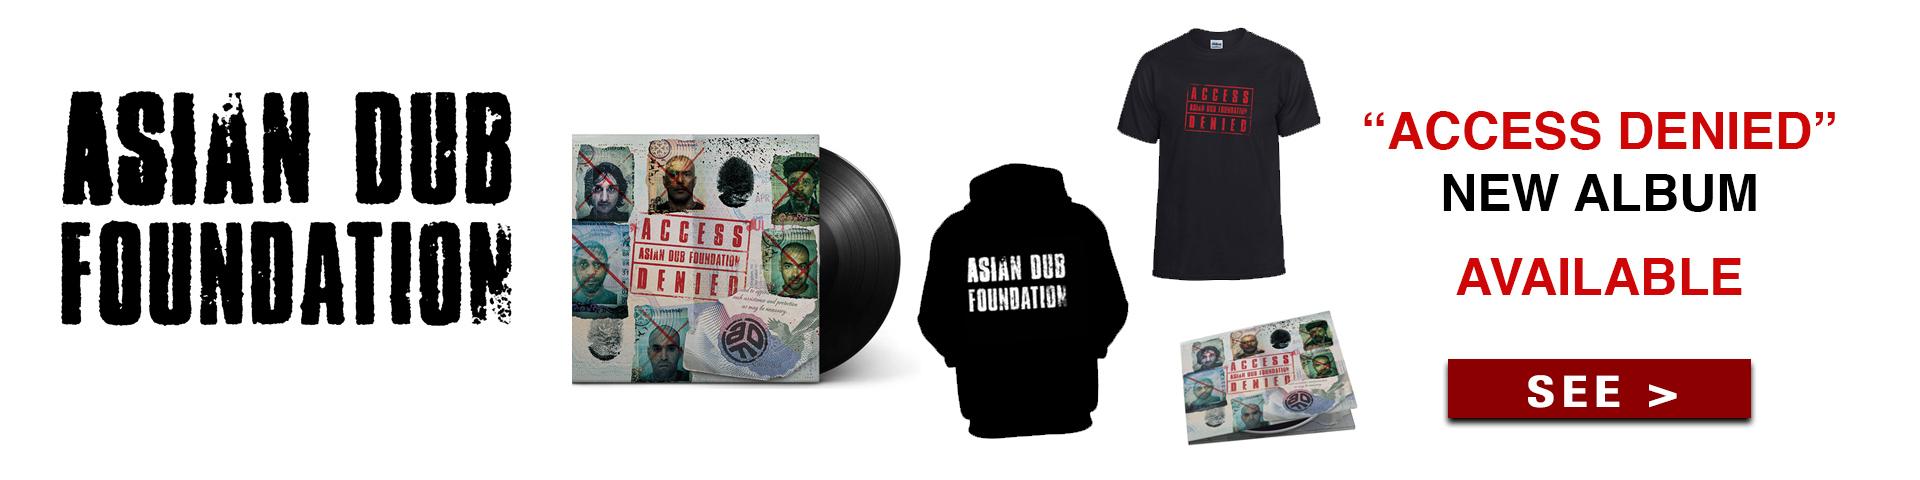 Asian dub foundation merchandising shop x-ray